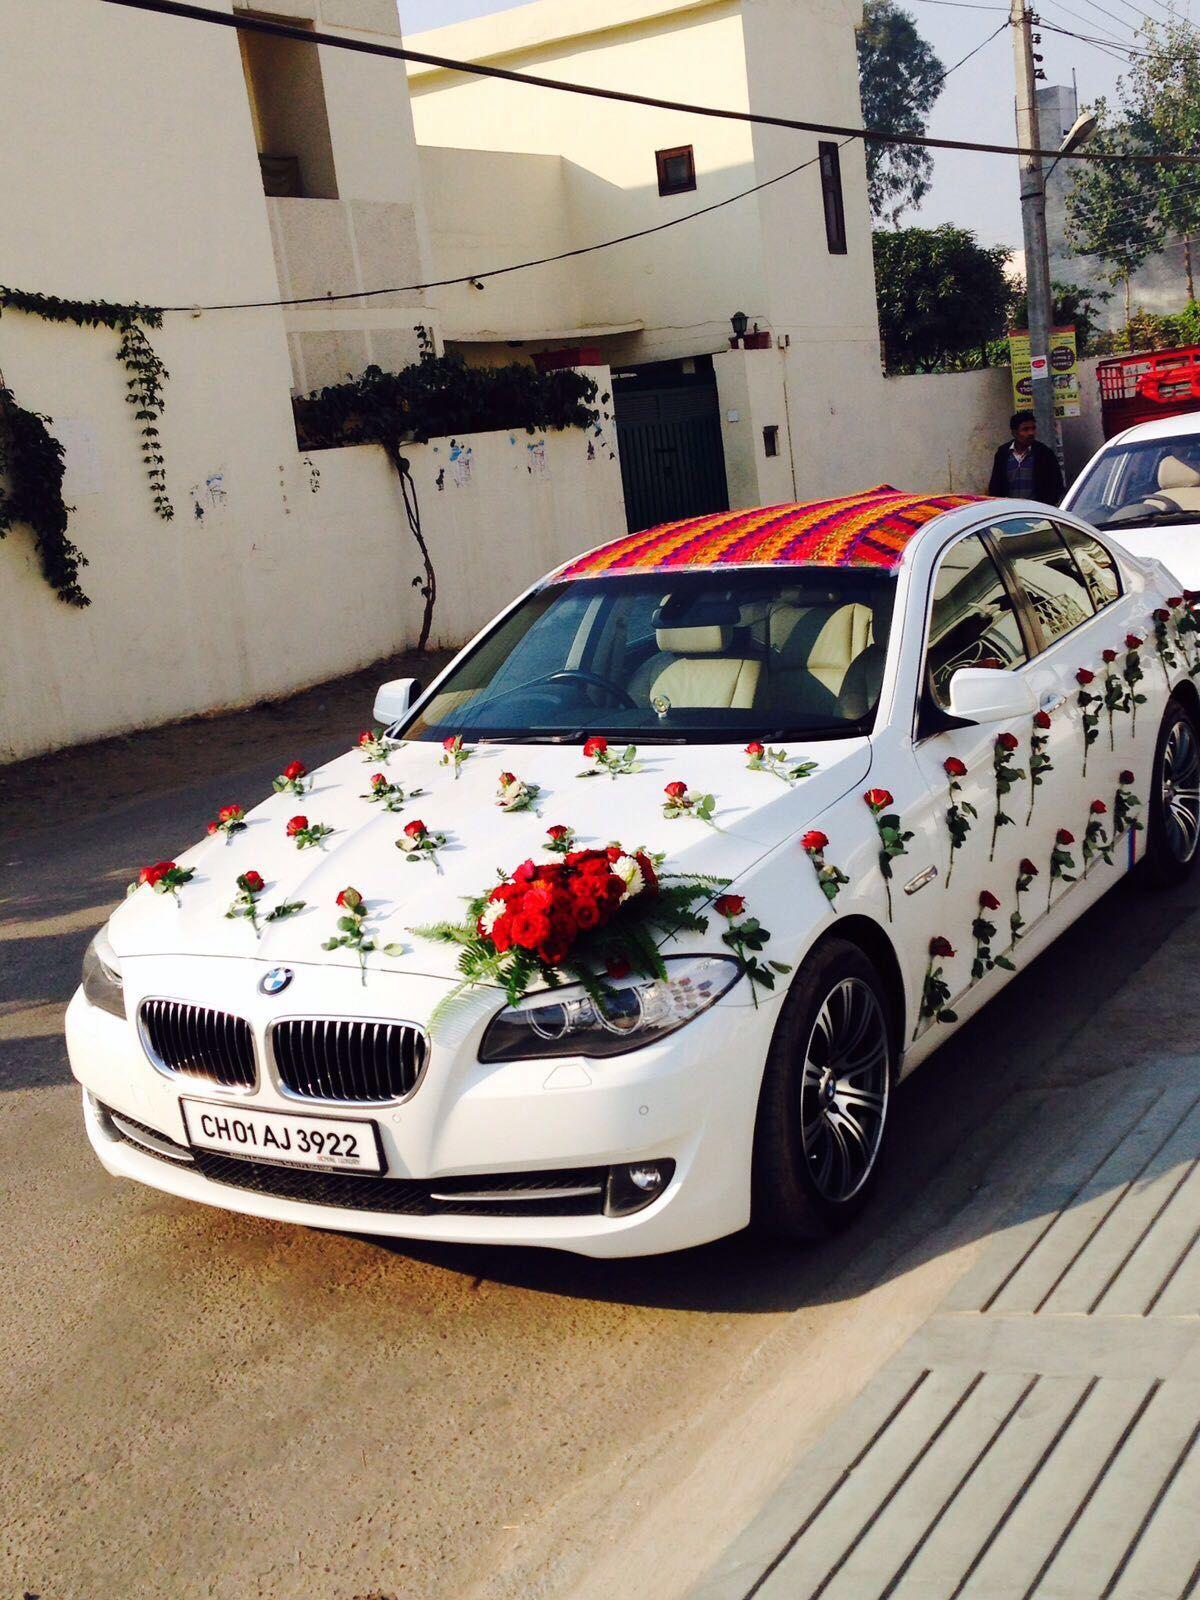 Much More Than You Expect With Wedding Car Hire Delhi Book A Wedding Cars Weddingcab Luxurycars Weddingcar Selfdr Wedding Car Hire Wedding Car Car Hire